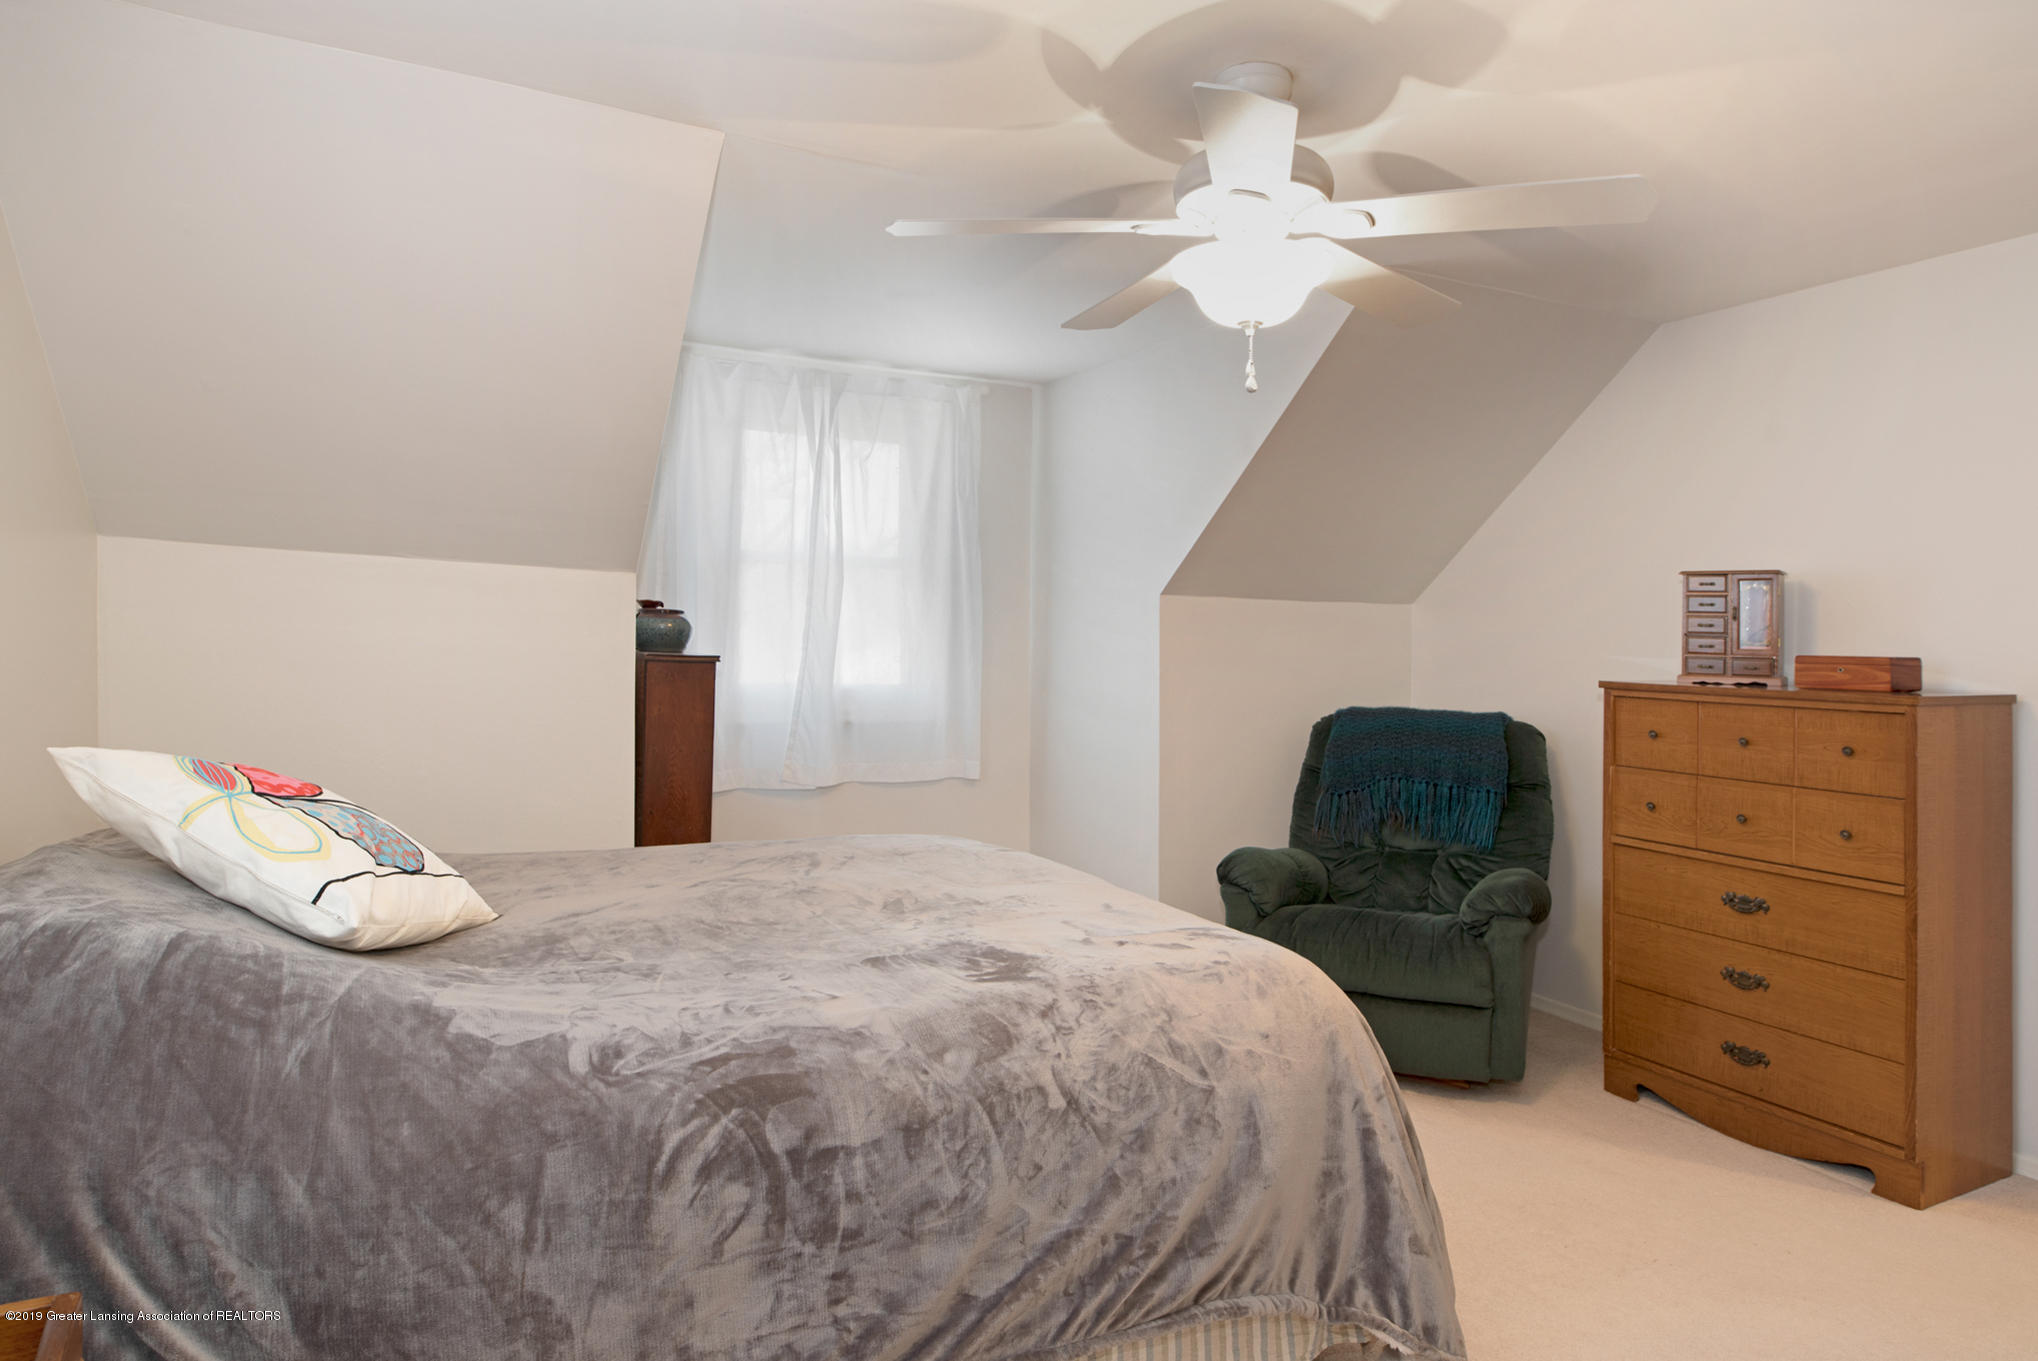 981 Ramblewood Dr - Bedroom 1 - 26